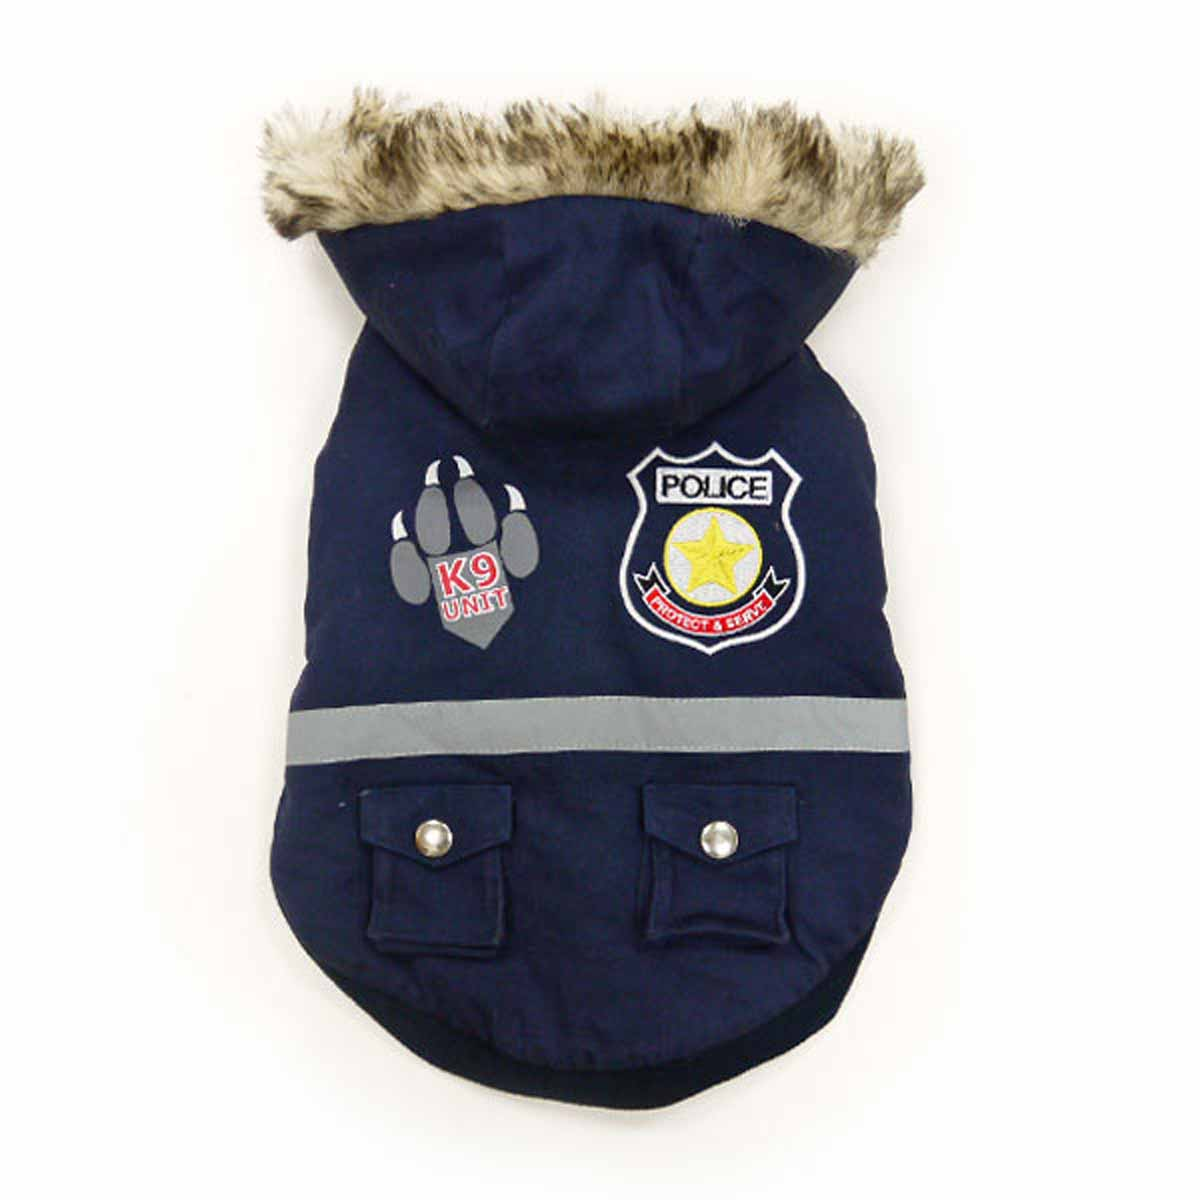 Police Dog Jacket by Dogo - Navy Blue